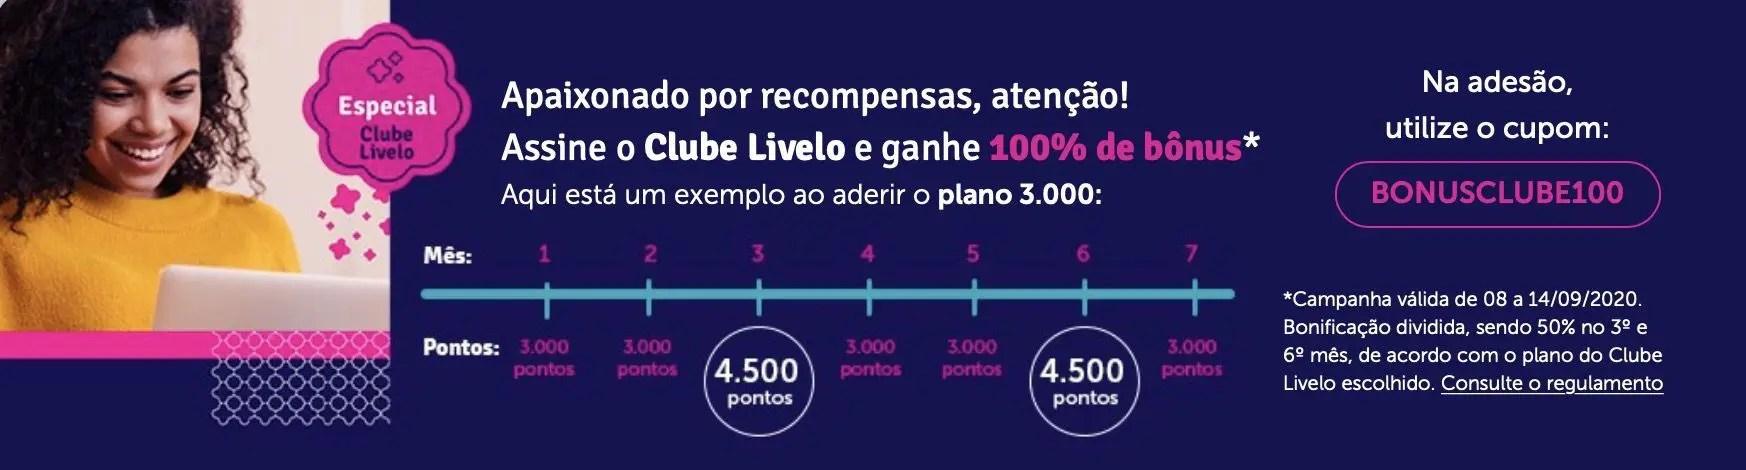 Clube Livelo 50% bônus